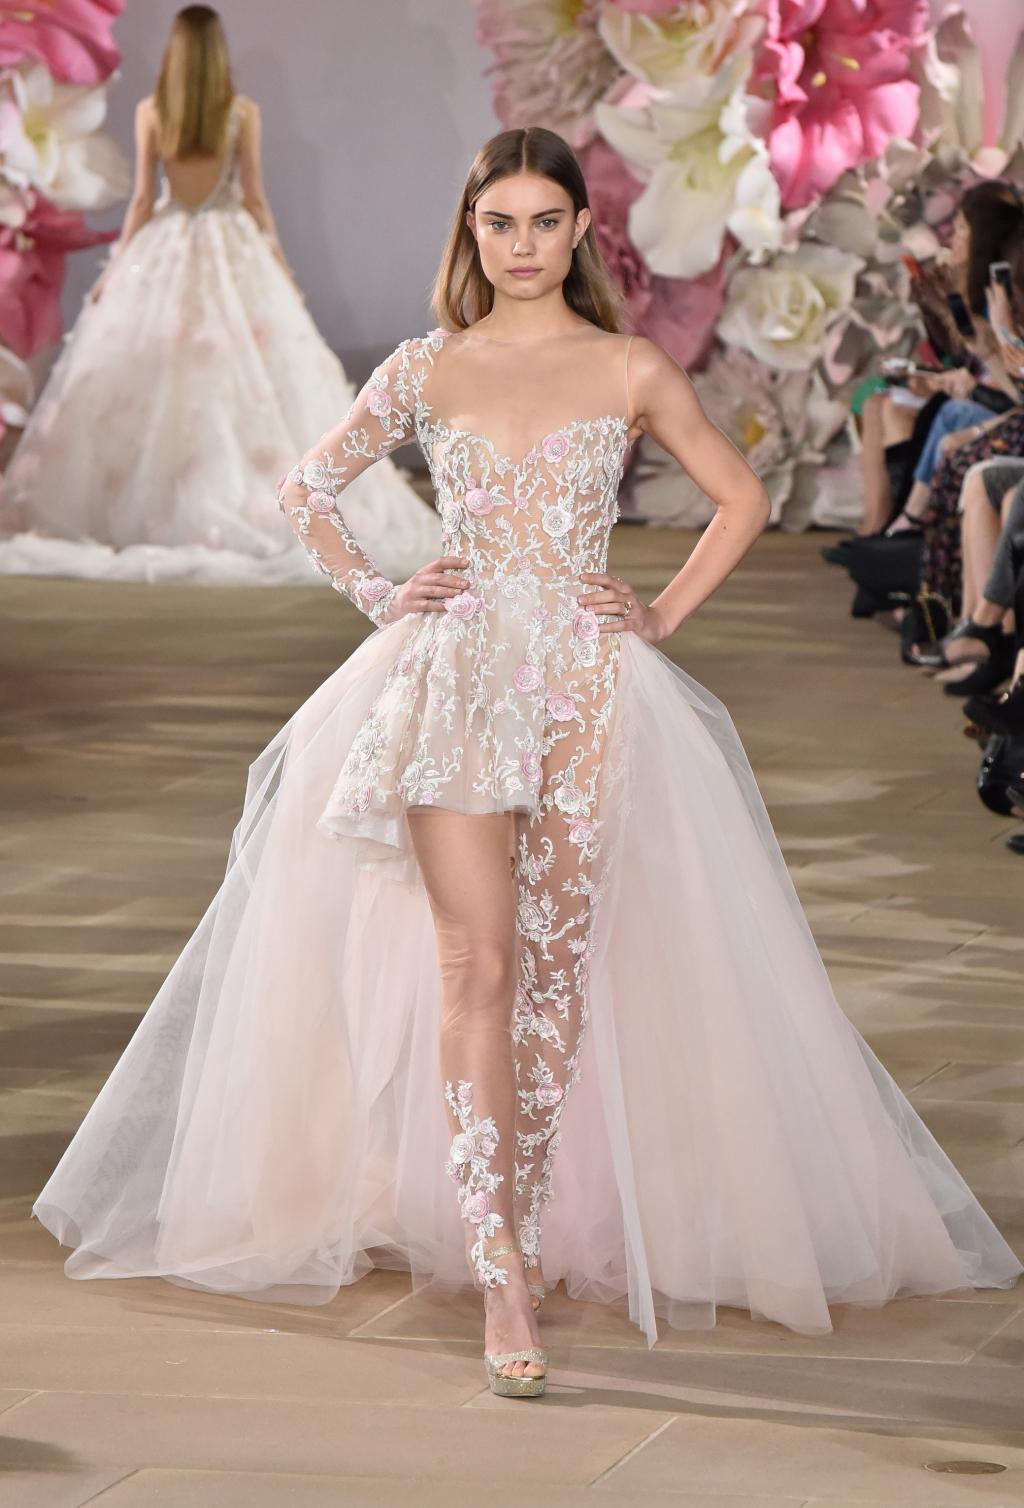 Zdroj fotky: http://inesdisanto.com/gown/vibrant/#.WJr5lXpc8mo